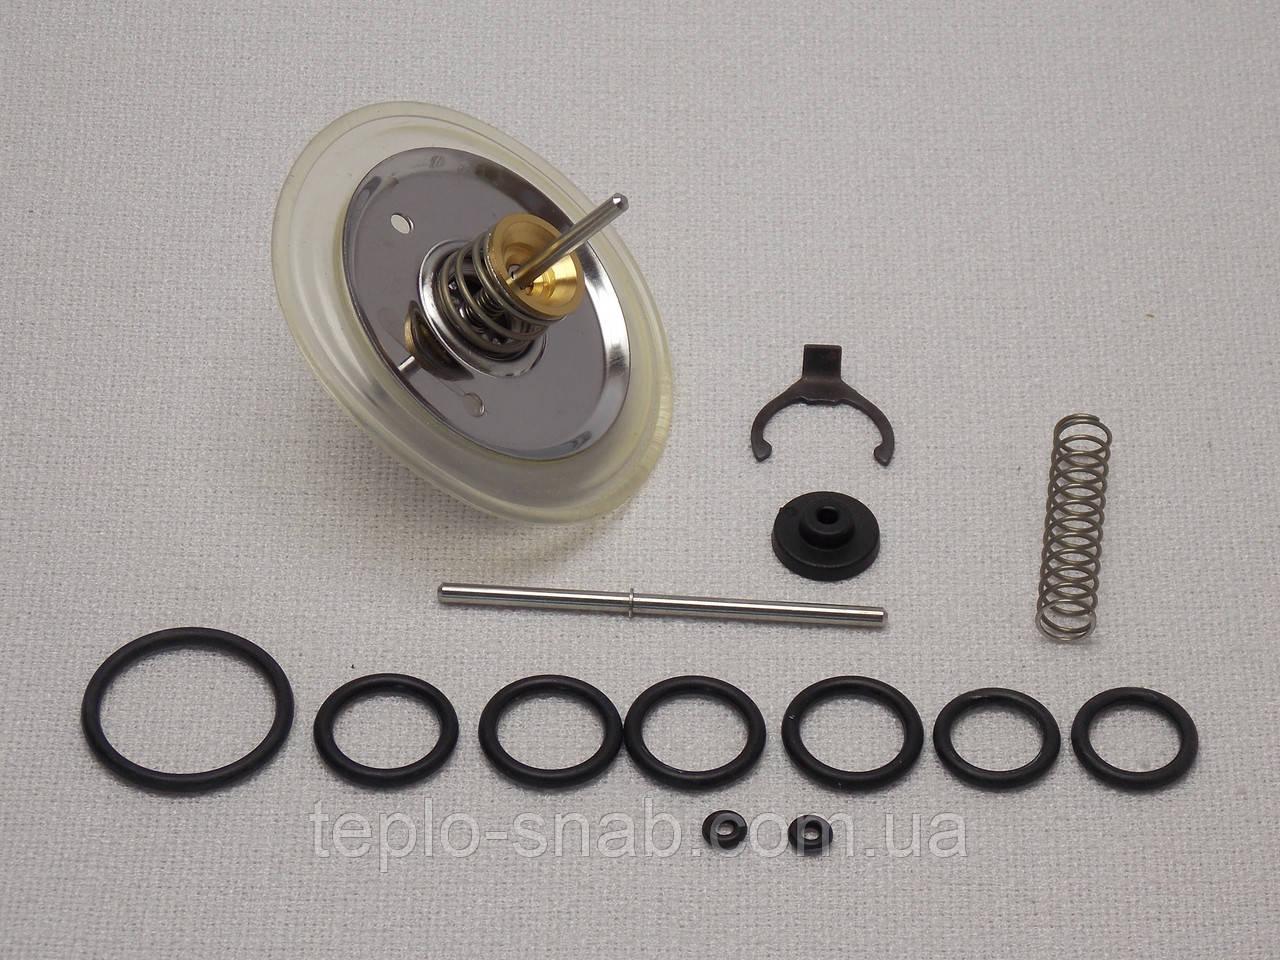 Ремкомплект 3-х ходового клапана газового навесного котла Sime. 6281540